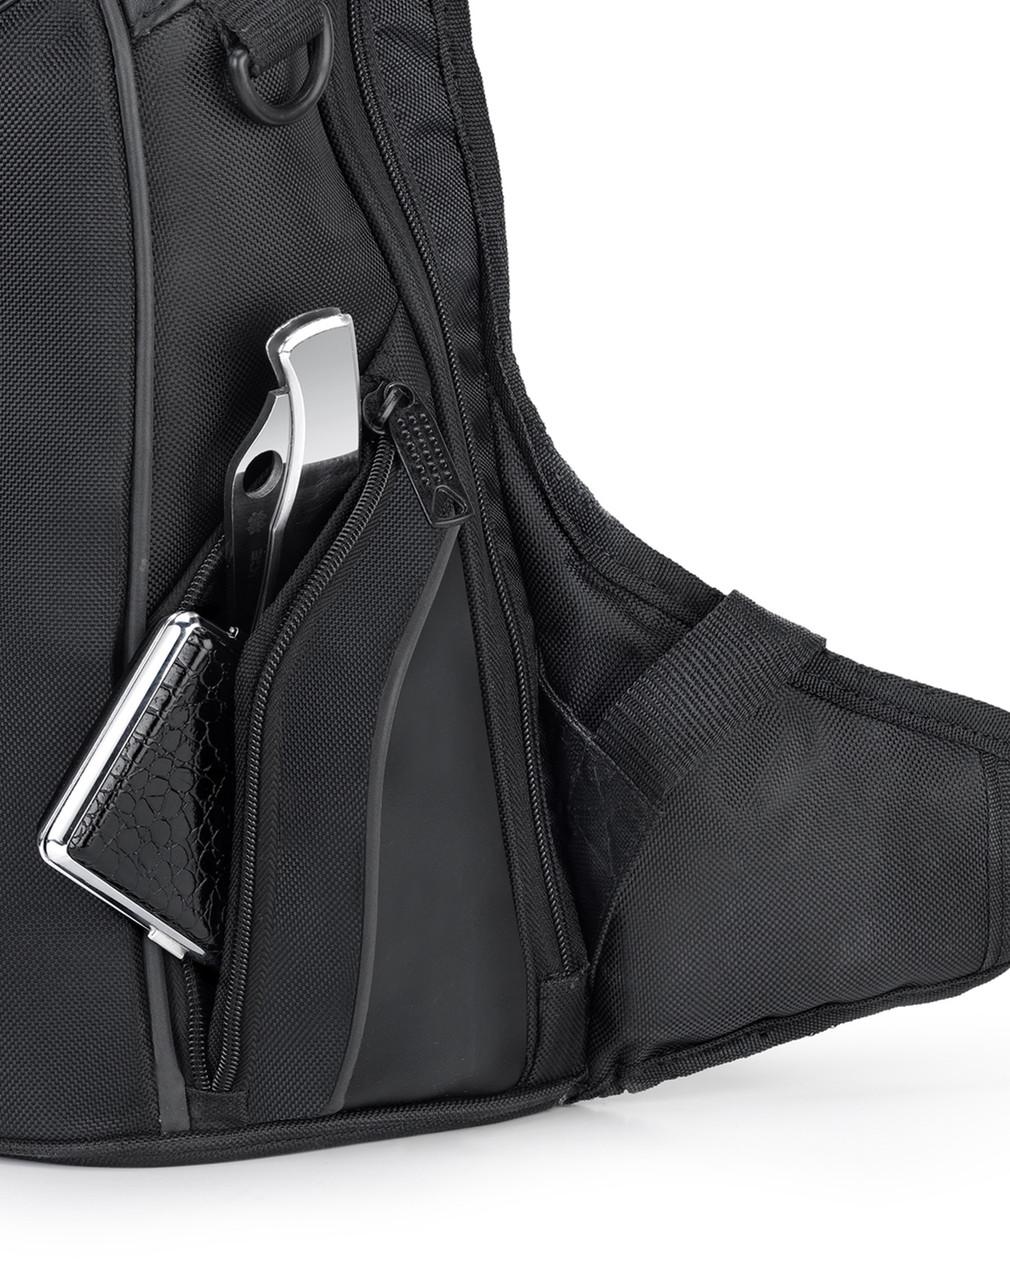 Yamaha Viking Motorcycle Medium Backpack Front Pocket